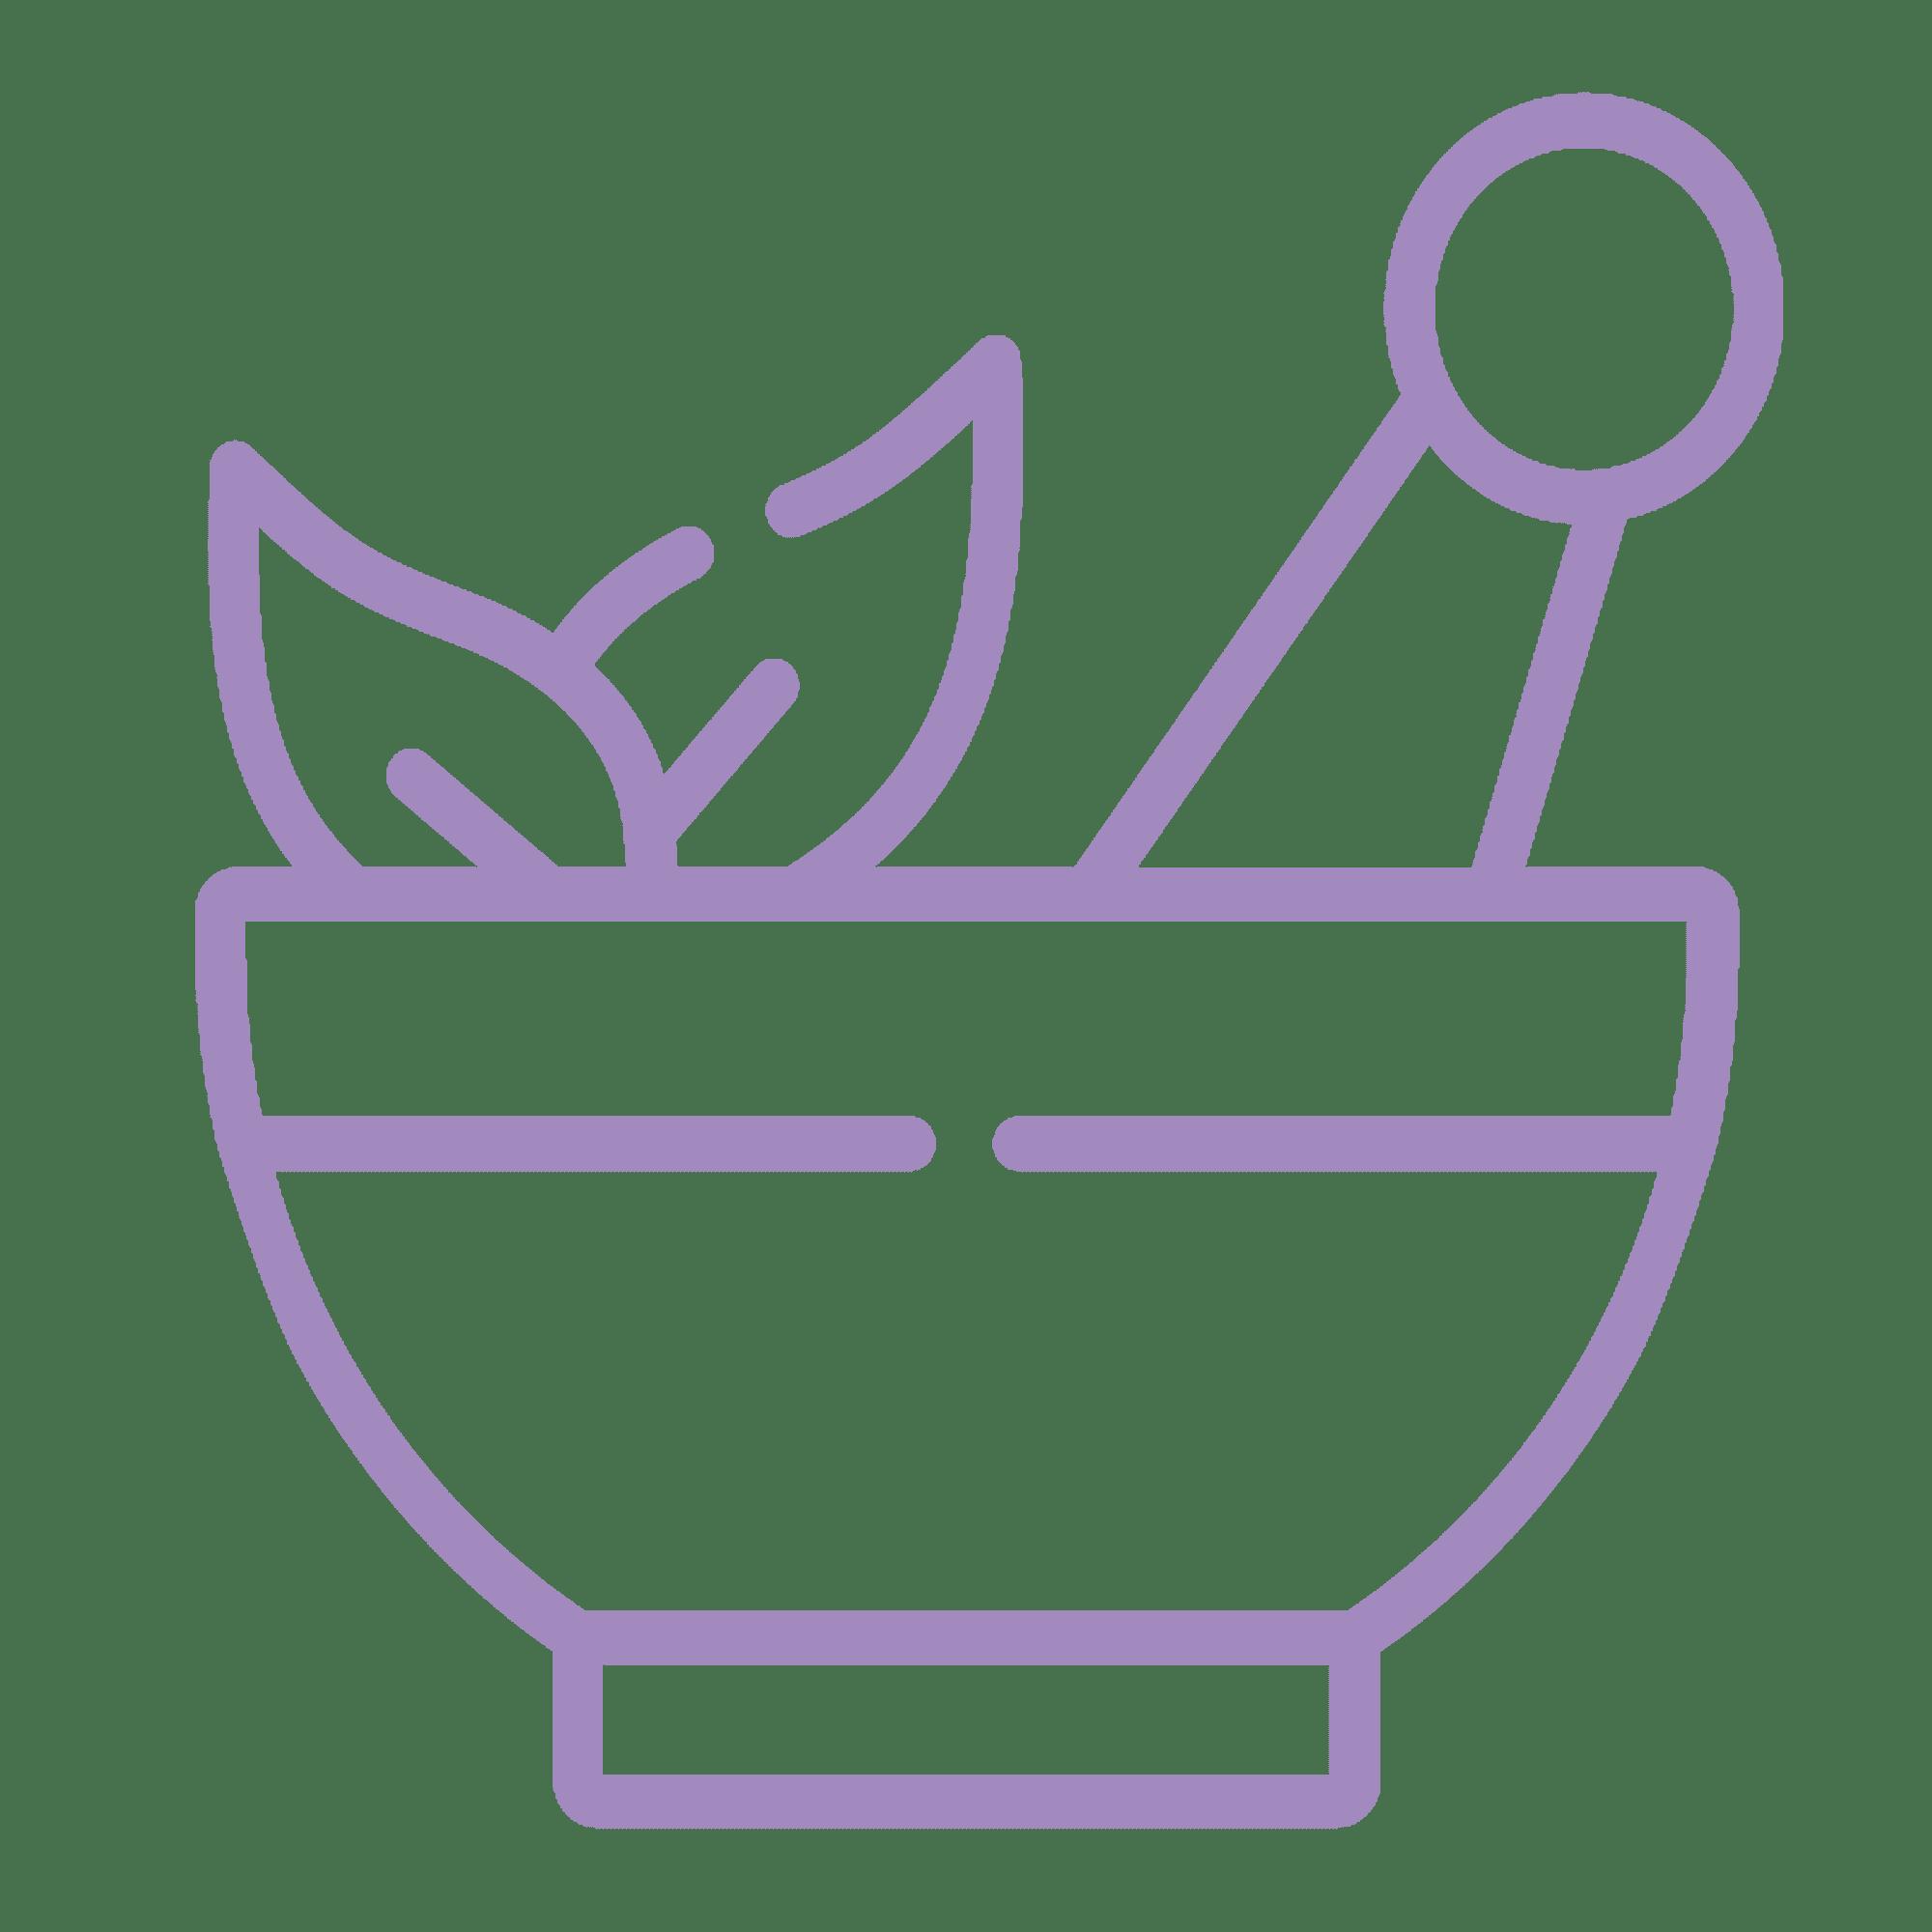 Ashwagandha An ancient herb used to help reduce stress.